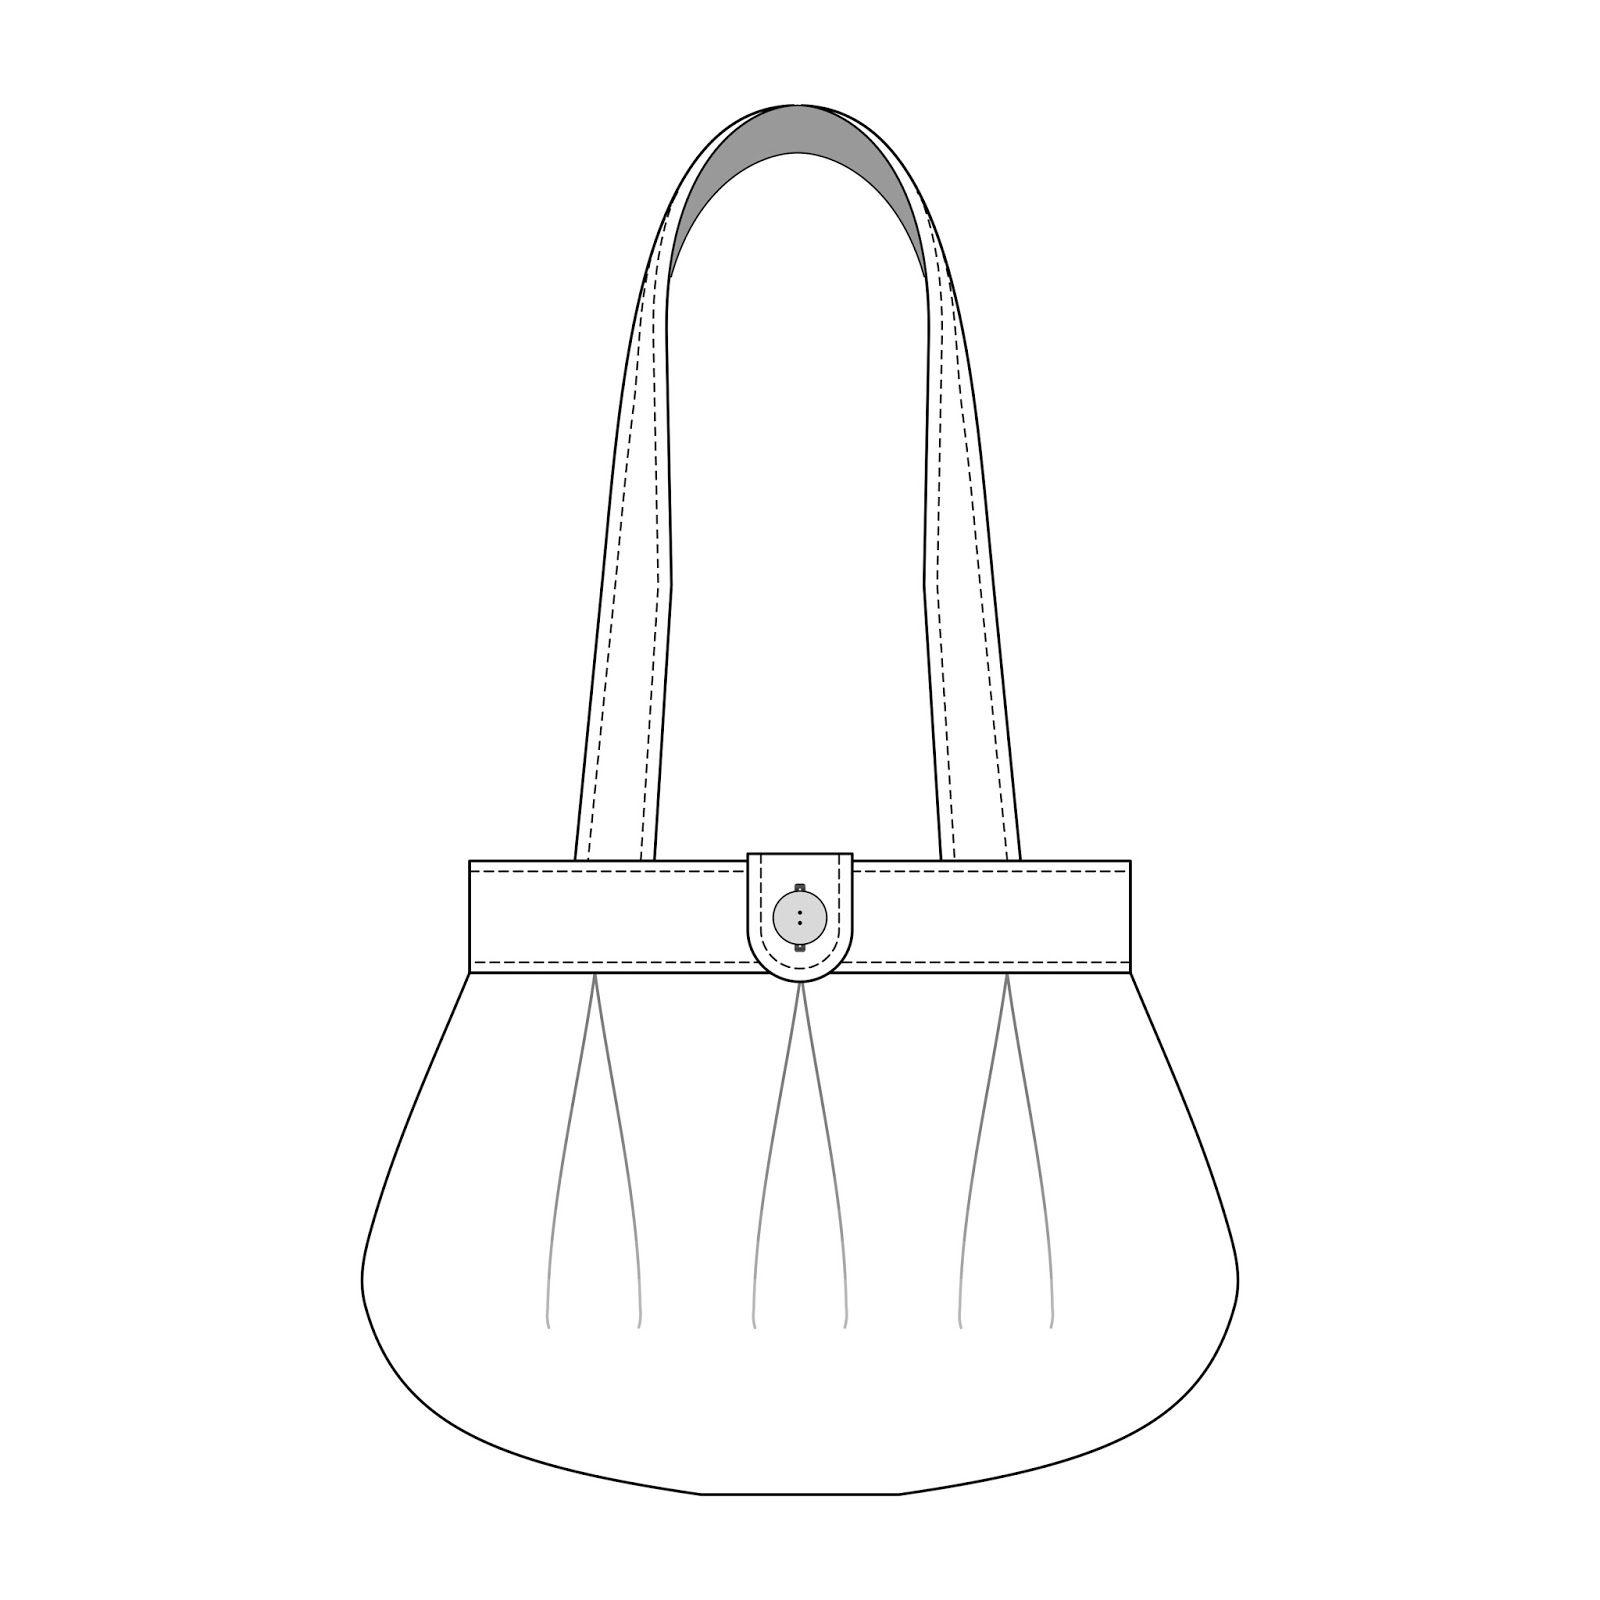 CLICK HERE TO BUY THE ANYA SHOULDER BAG PATTERN - £5.00       Meet the Anya shoulder bag pattern...       Style:     The Anya should...